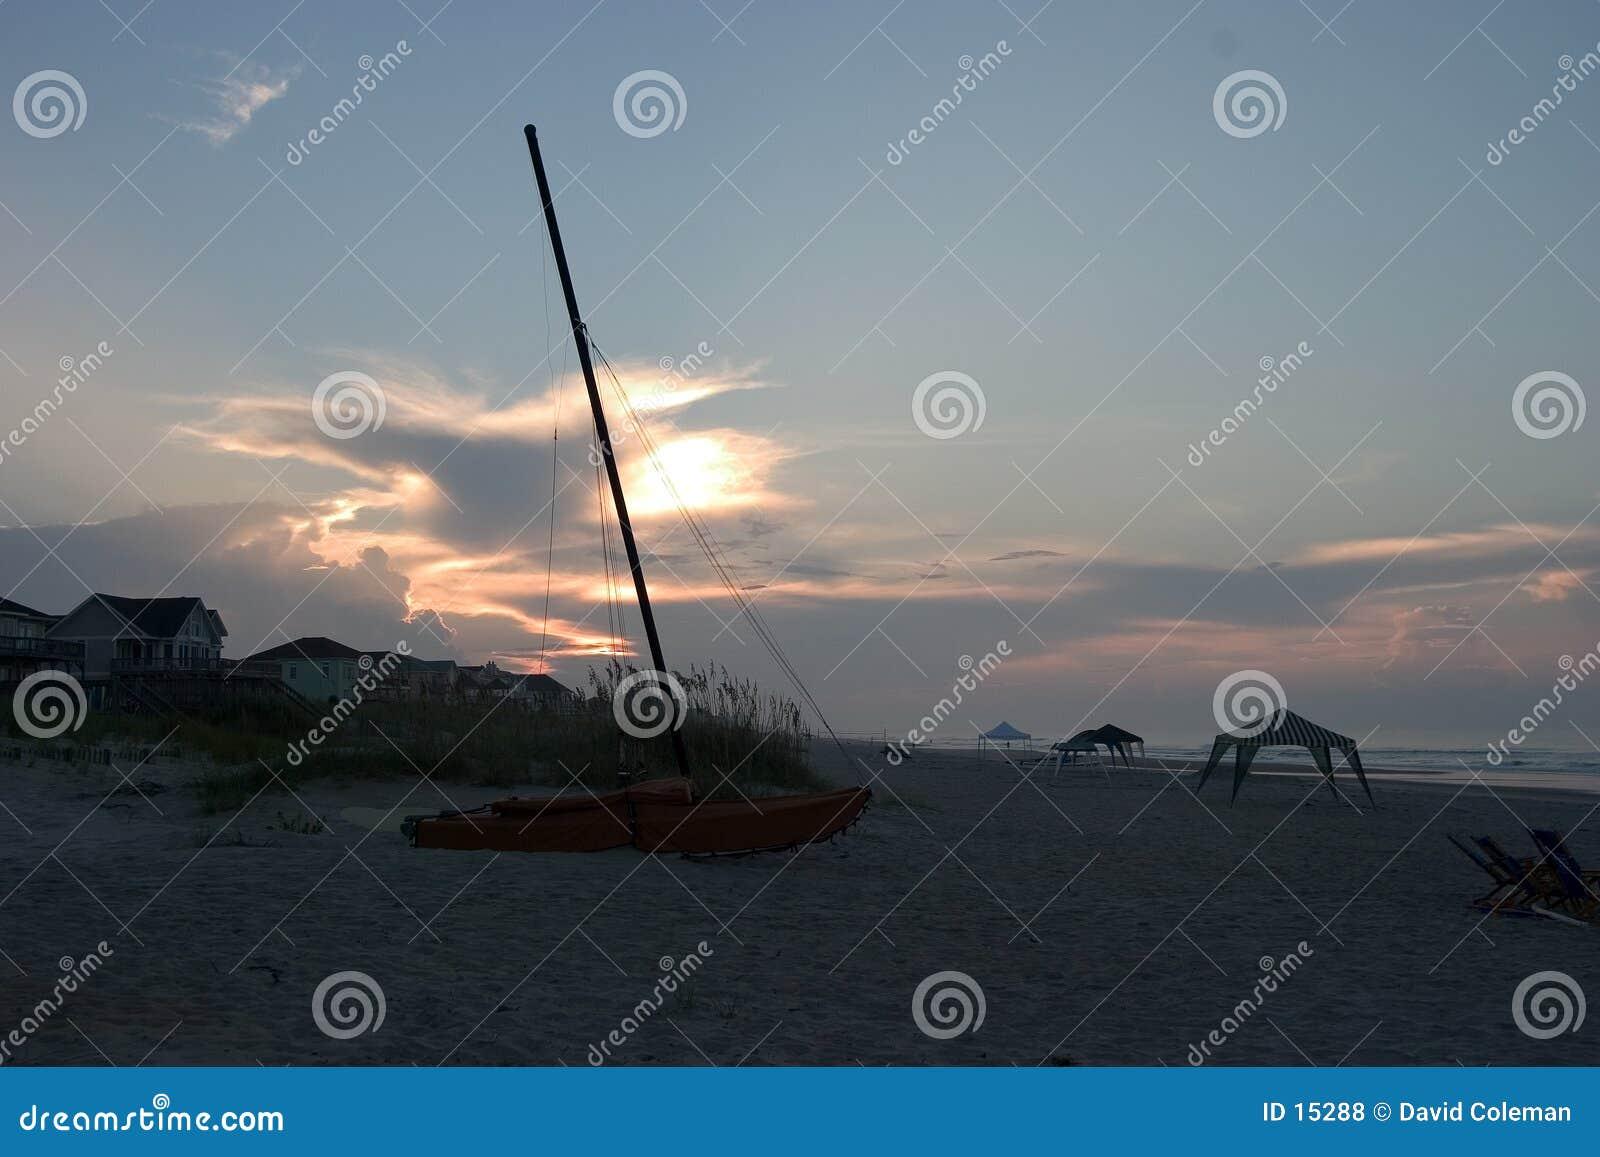 Katamaran auf Strand, Sonnenaufgang